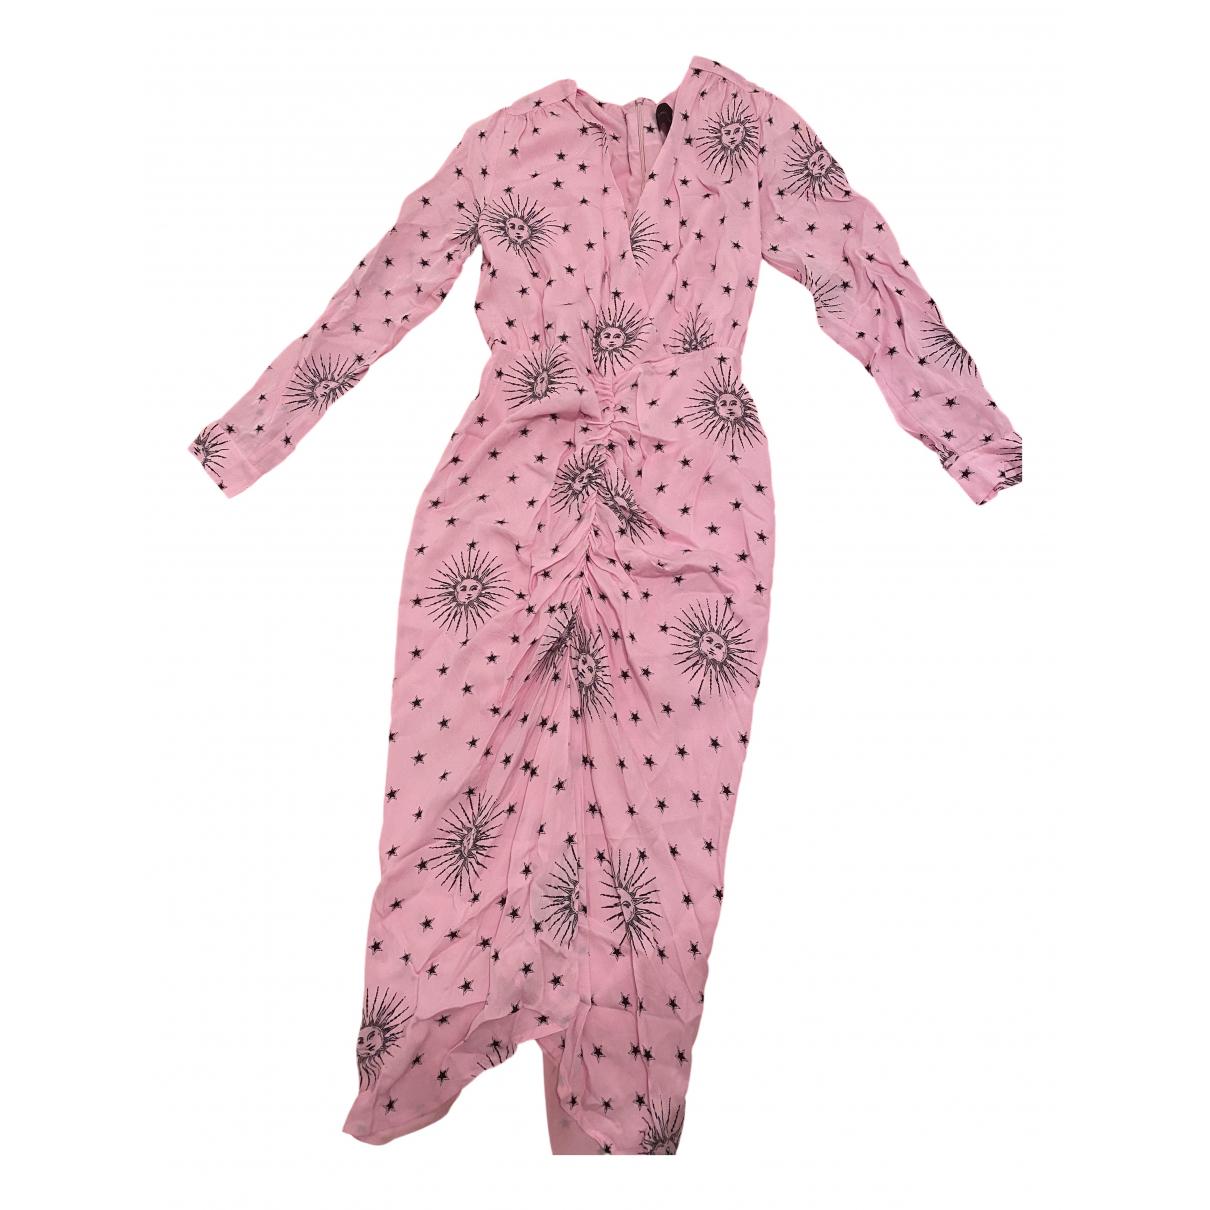 Birgitte Herskind \N Pink dress for Women 38 FR